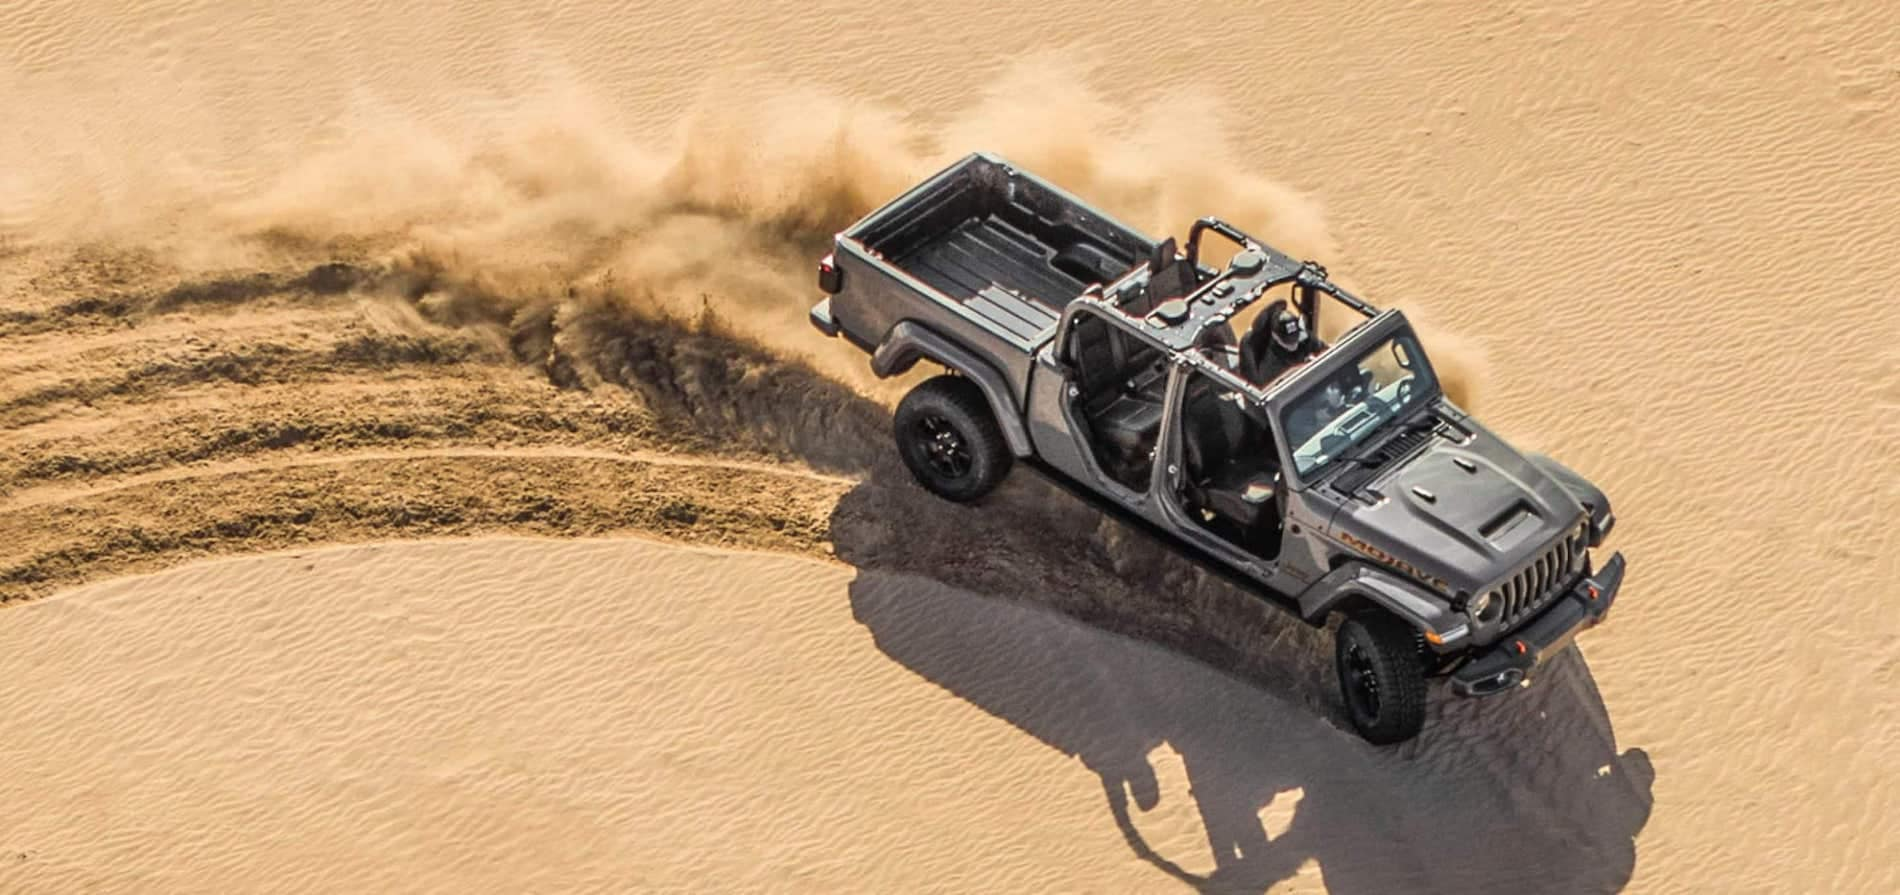 2021 Jeep Gladiator Engine Options Springfield, VA